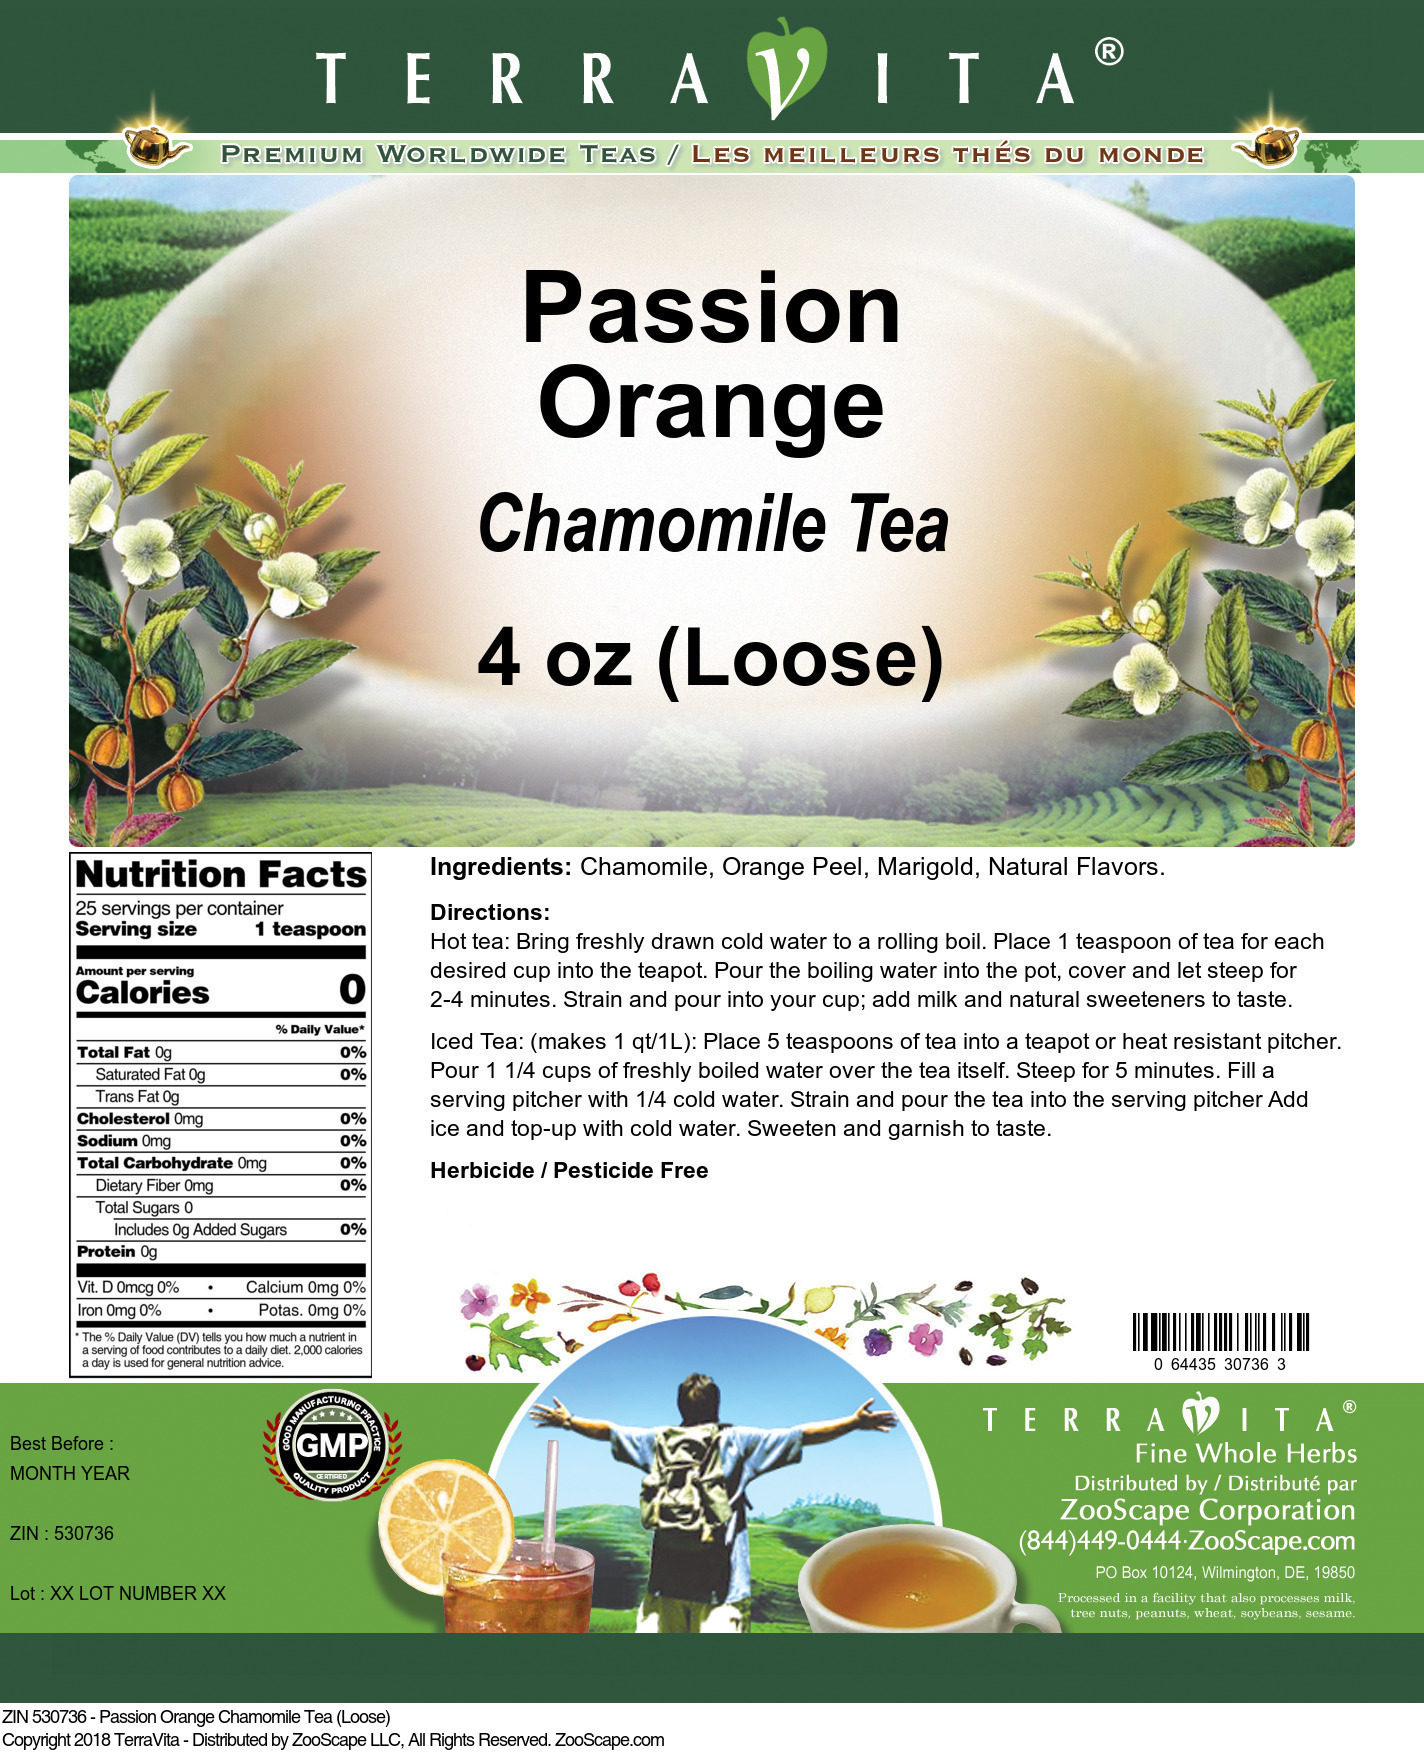 Passion Orange Chamomile Tea